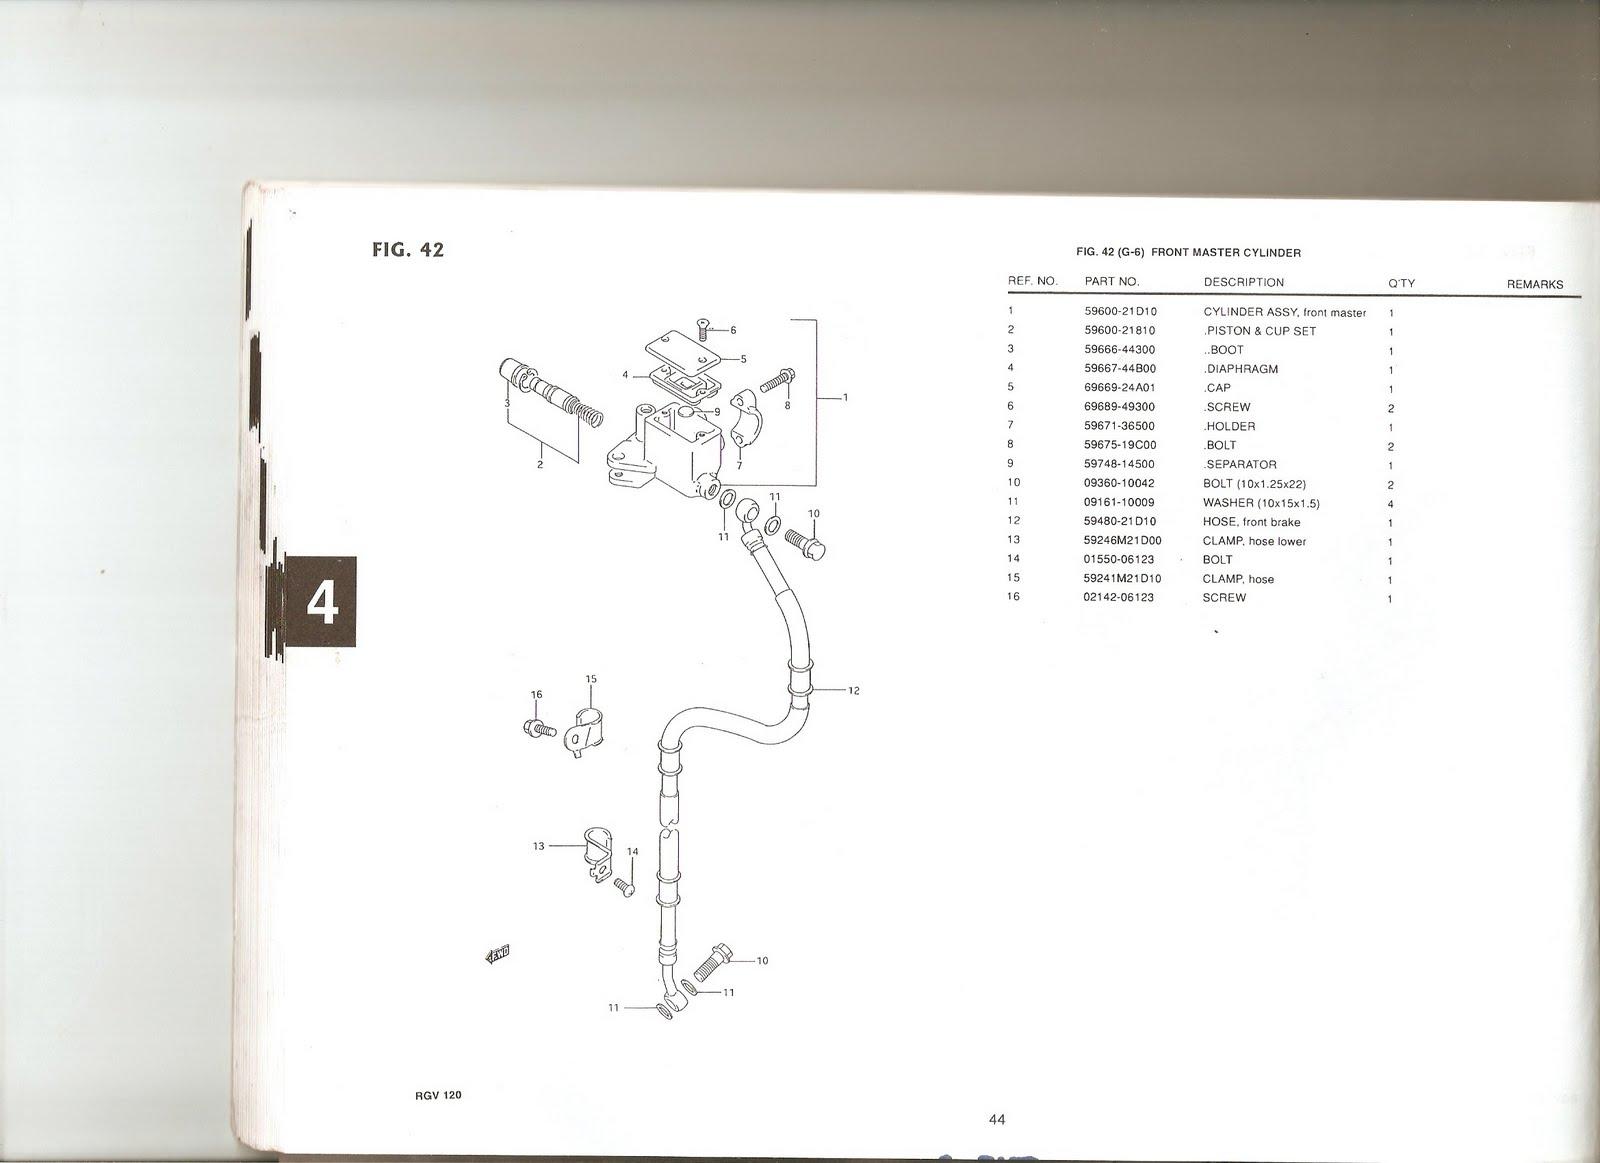 Wiring Diagram Suzuki Rgv 120 Enthusiast Diagrams Capacitor Further Washing Machine Rgv120 Katalog Rh Rgv120katalog Blogspot Com Sport Rgx